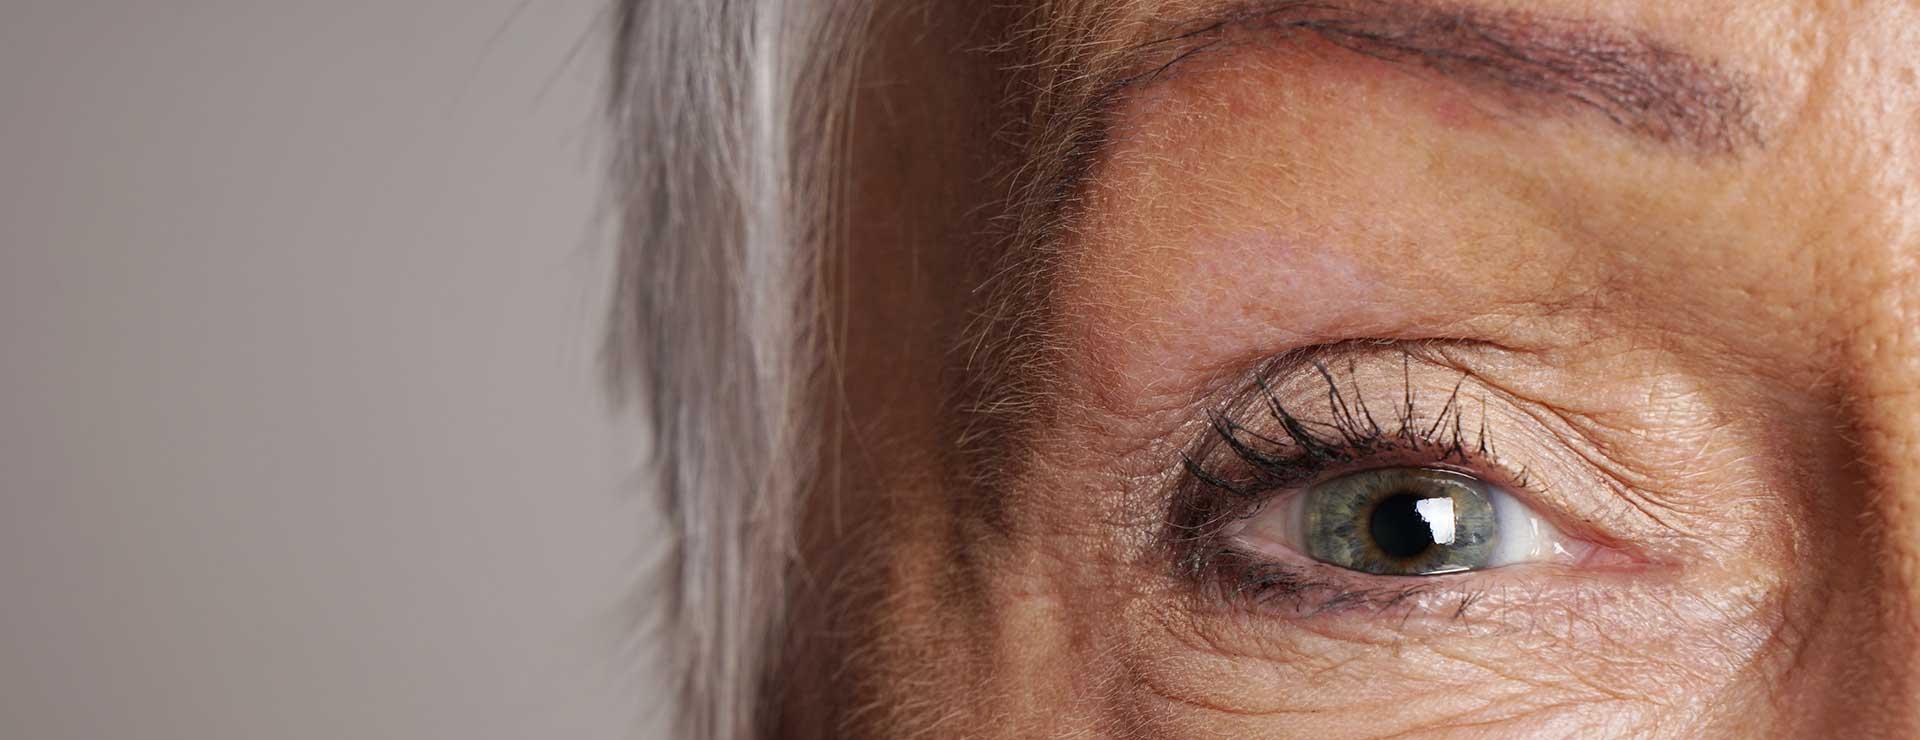 Optic Neuritis   Johns Hopkins Medicine